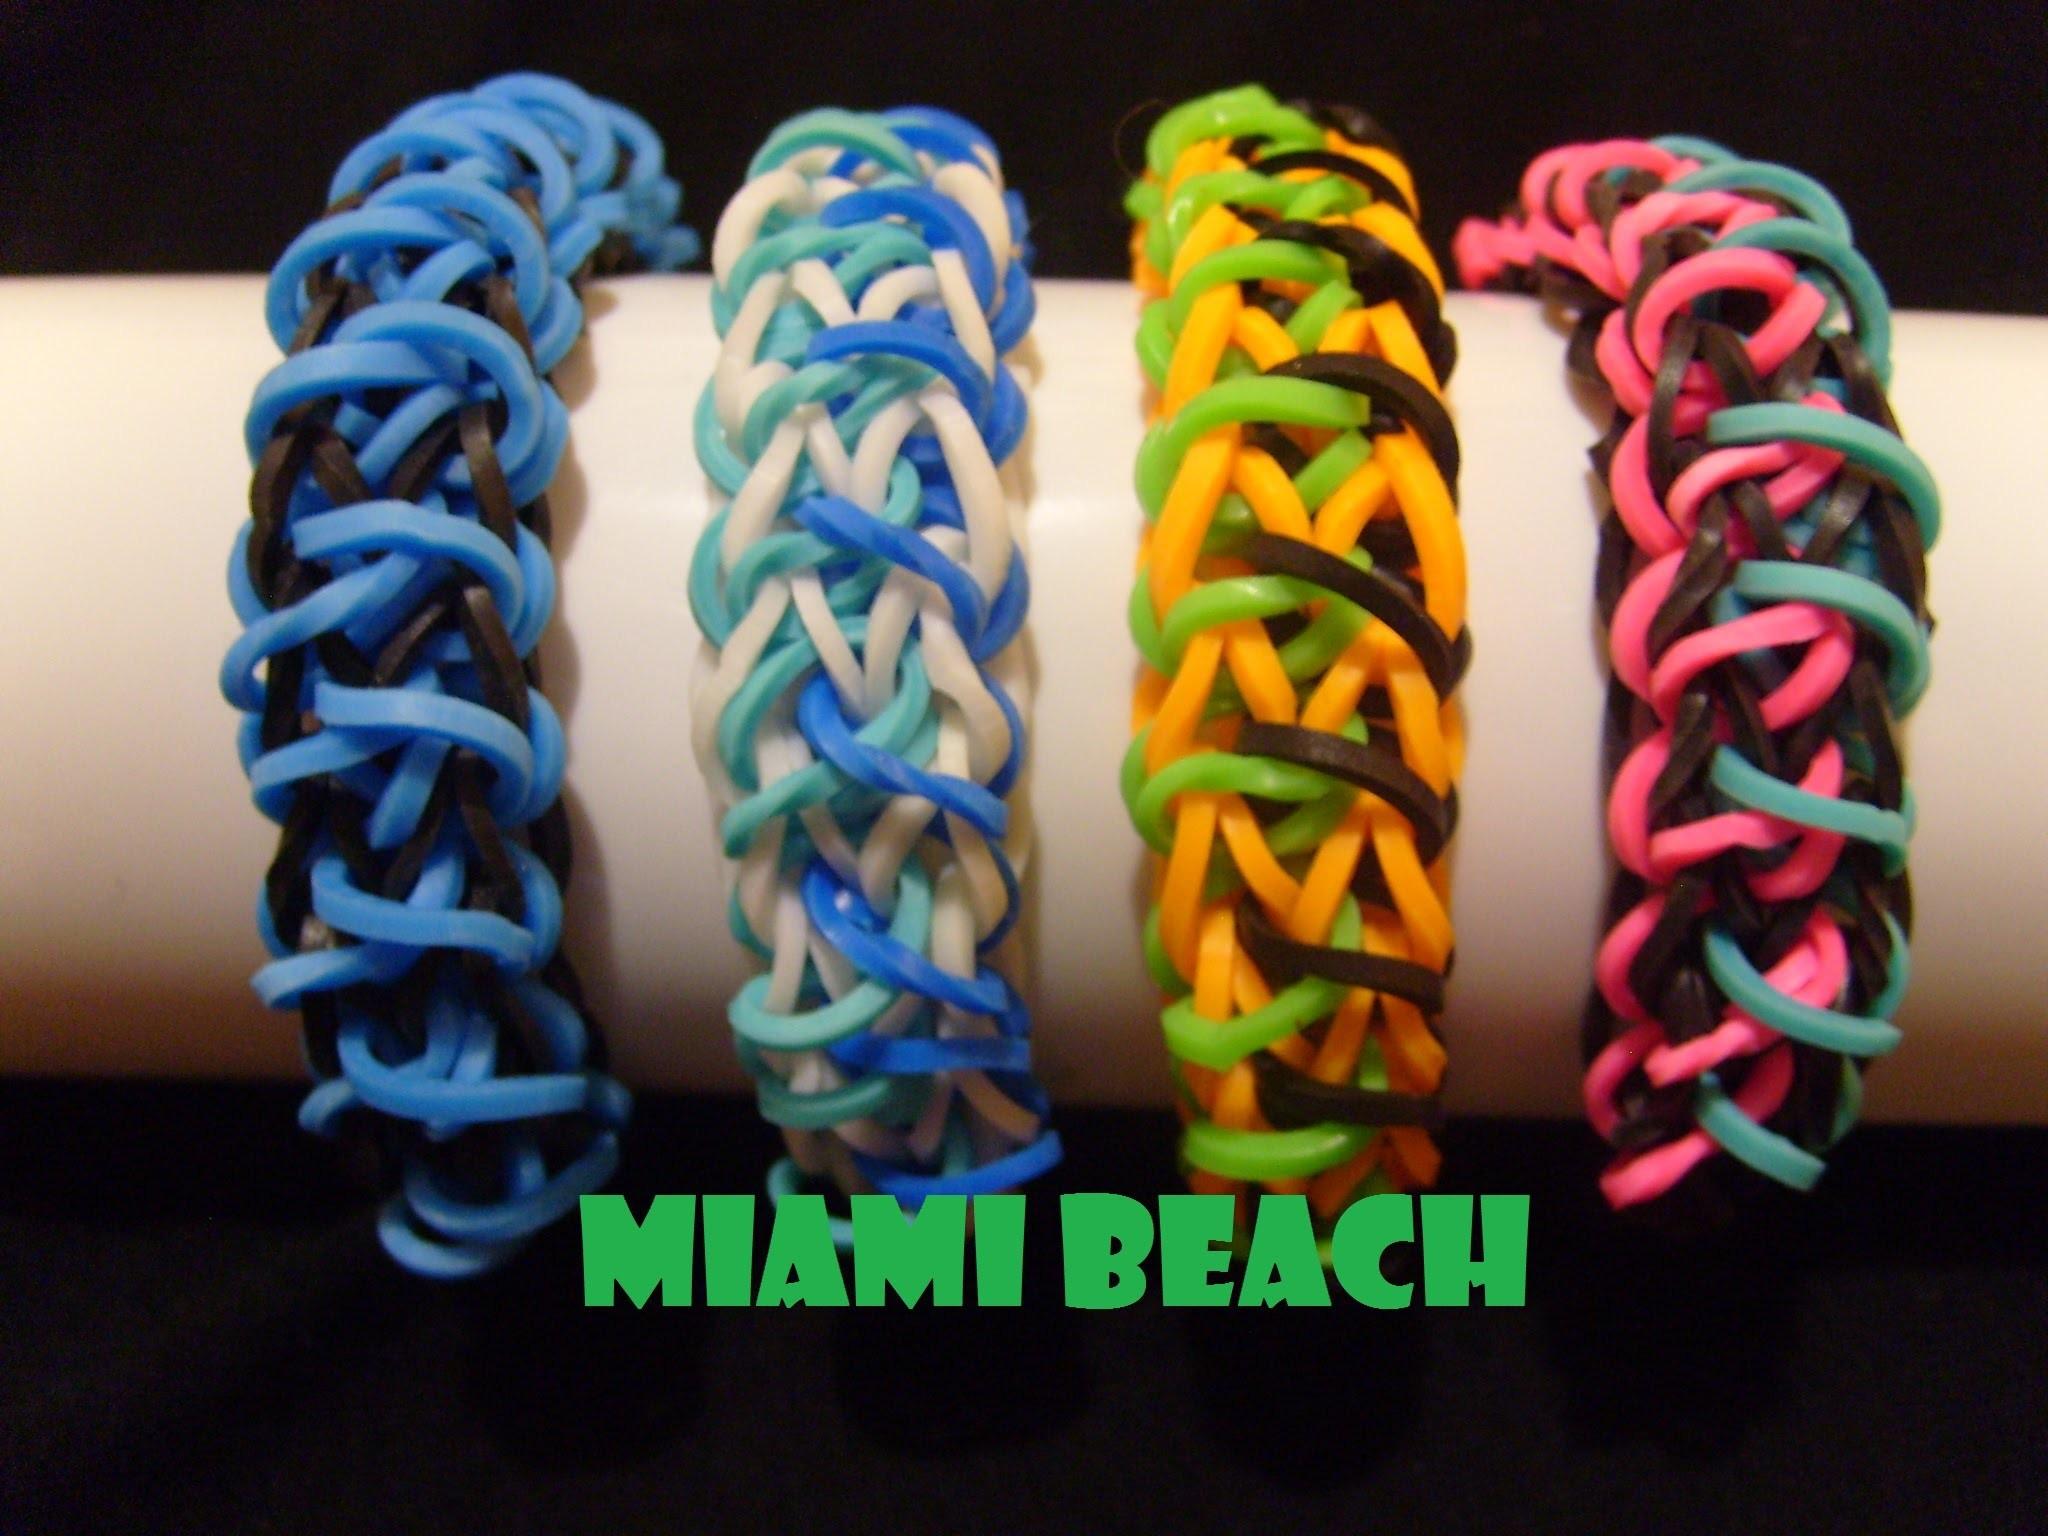 Bracelet elastique Miami Beach, tuto francais, rainbow loom bands